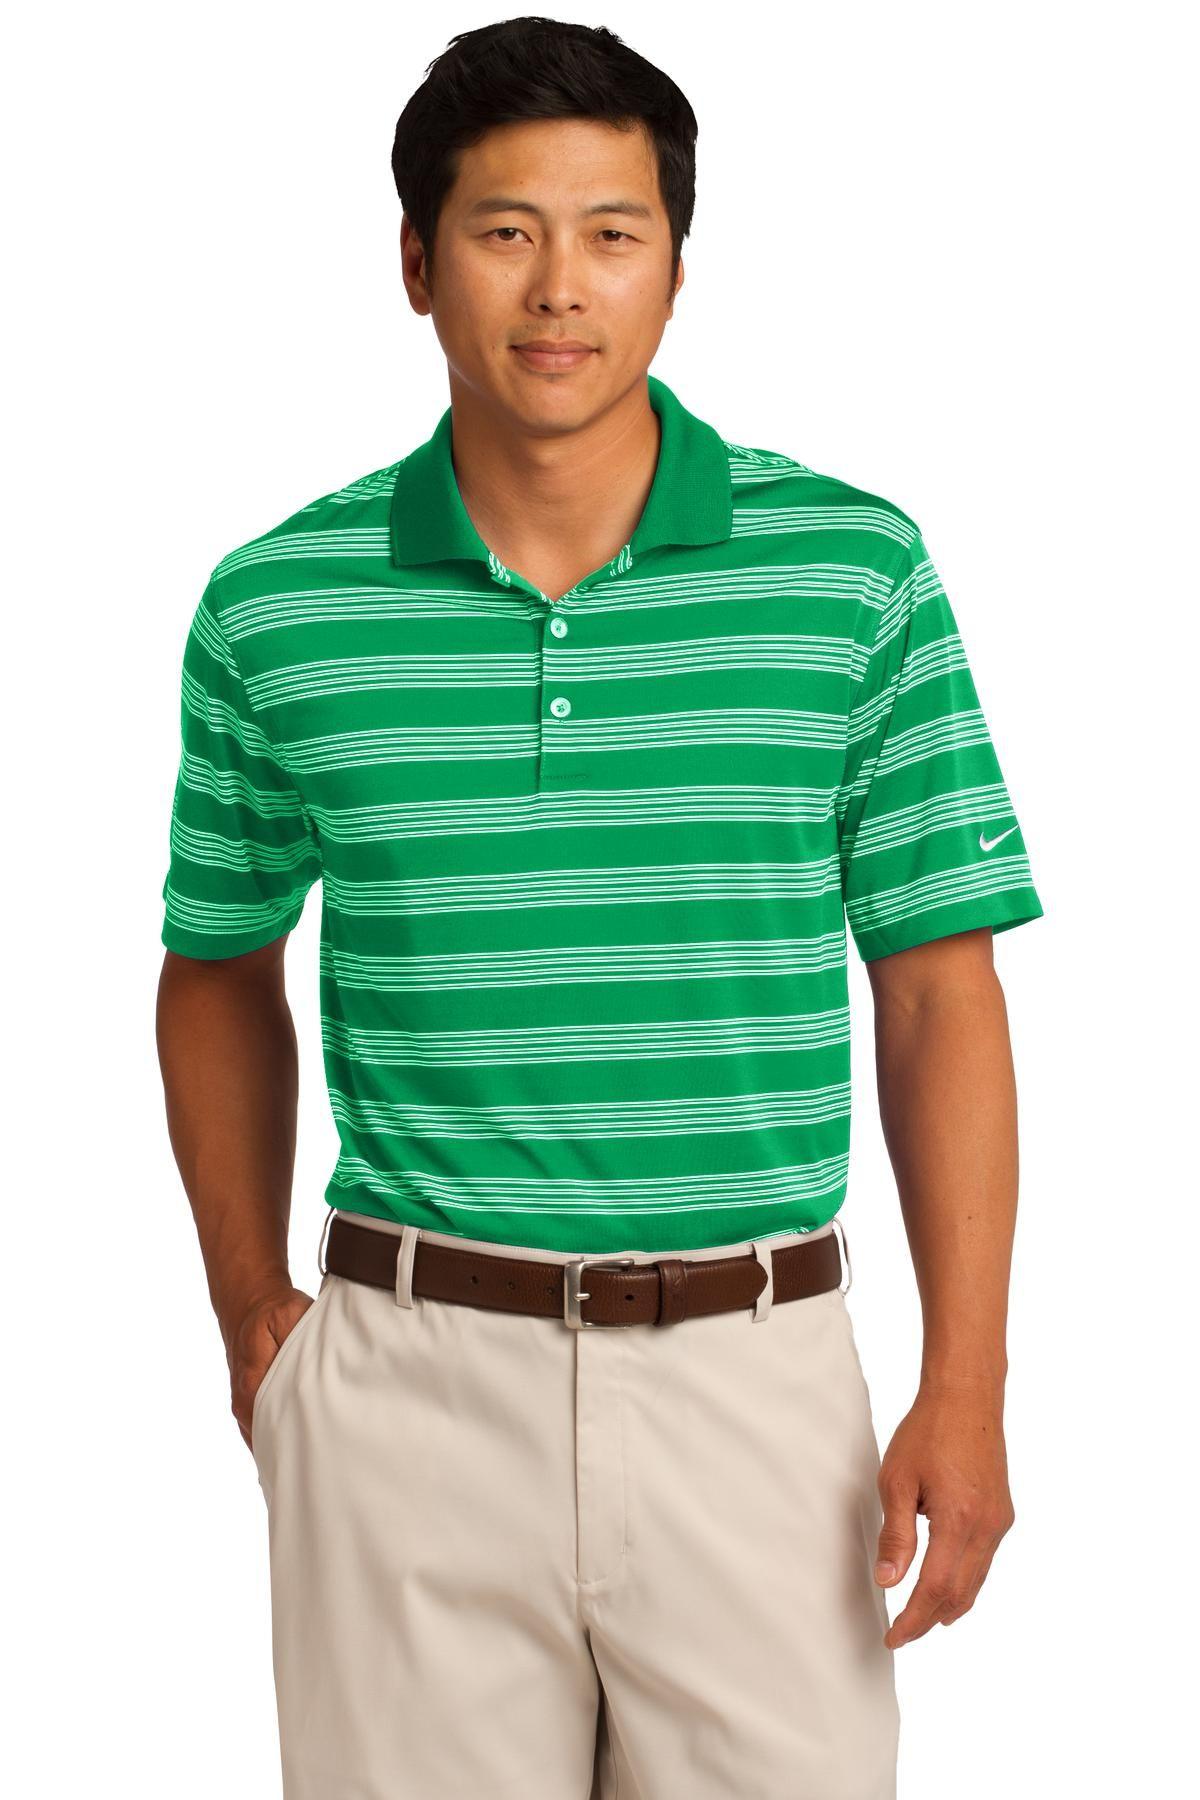 67 stripe sanmar wholesale imprintable apparel